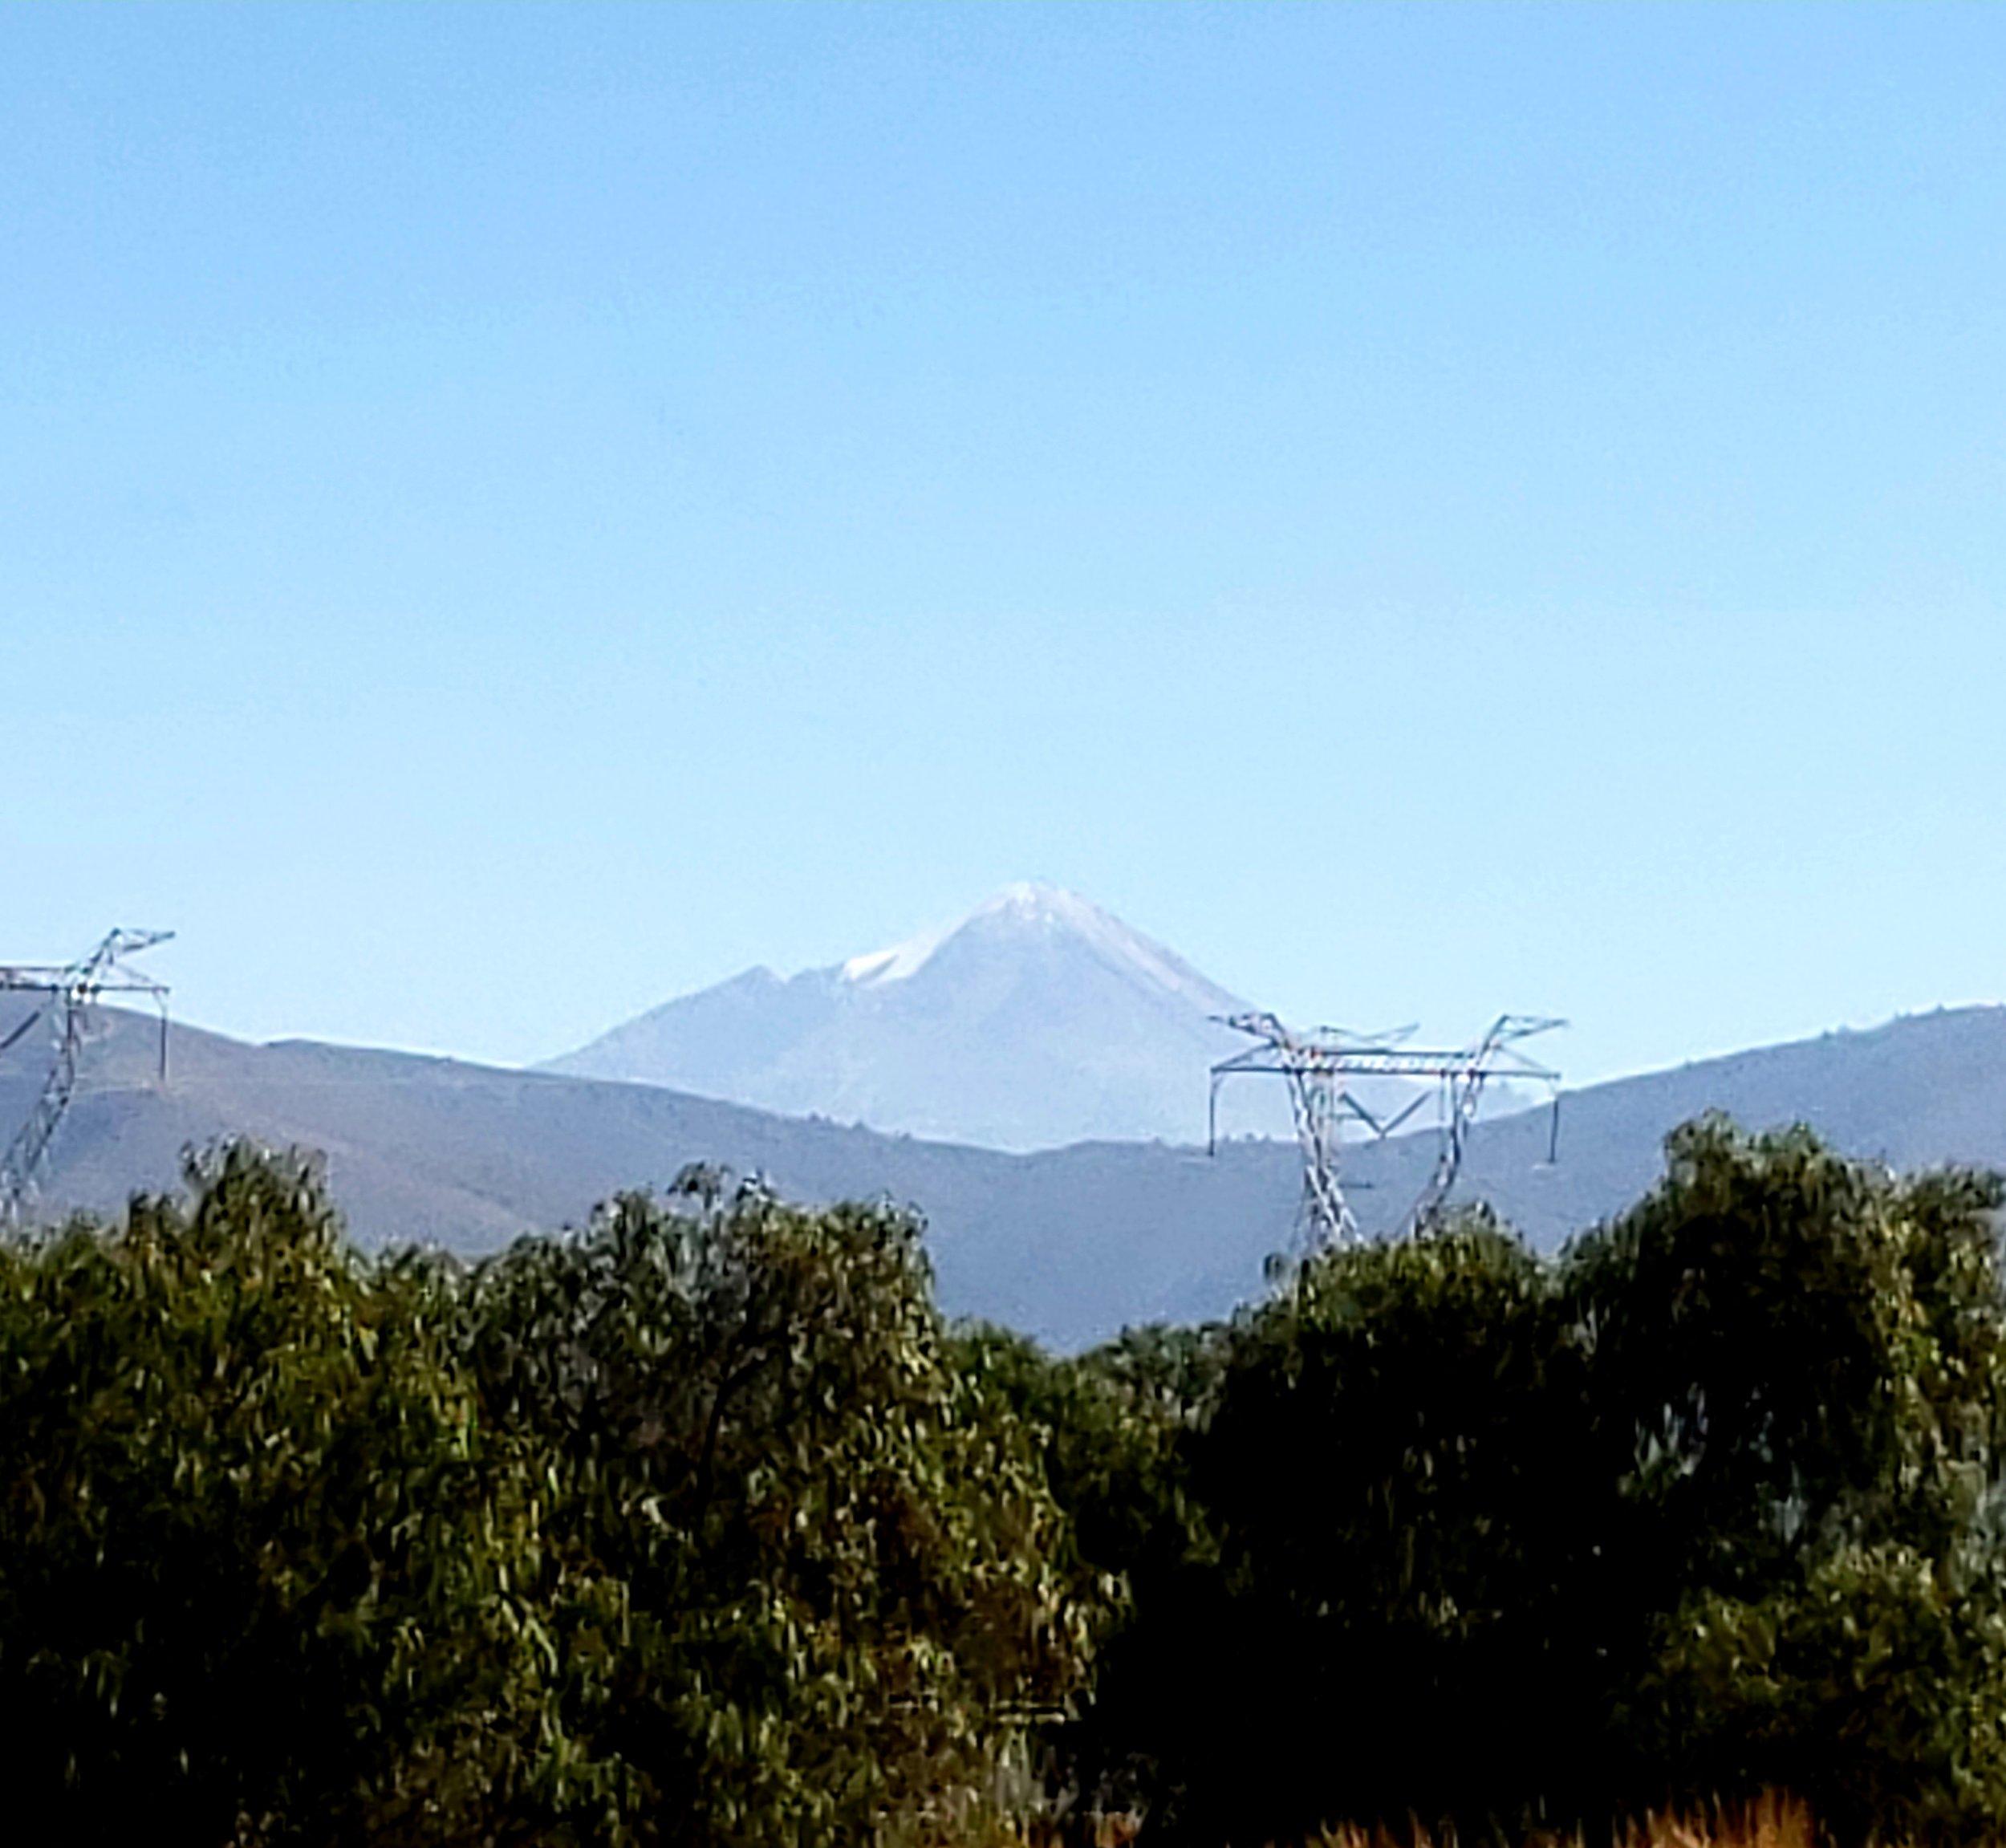 Pico de Orizaba, highest in Mexico, from near Puebla